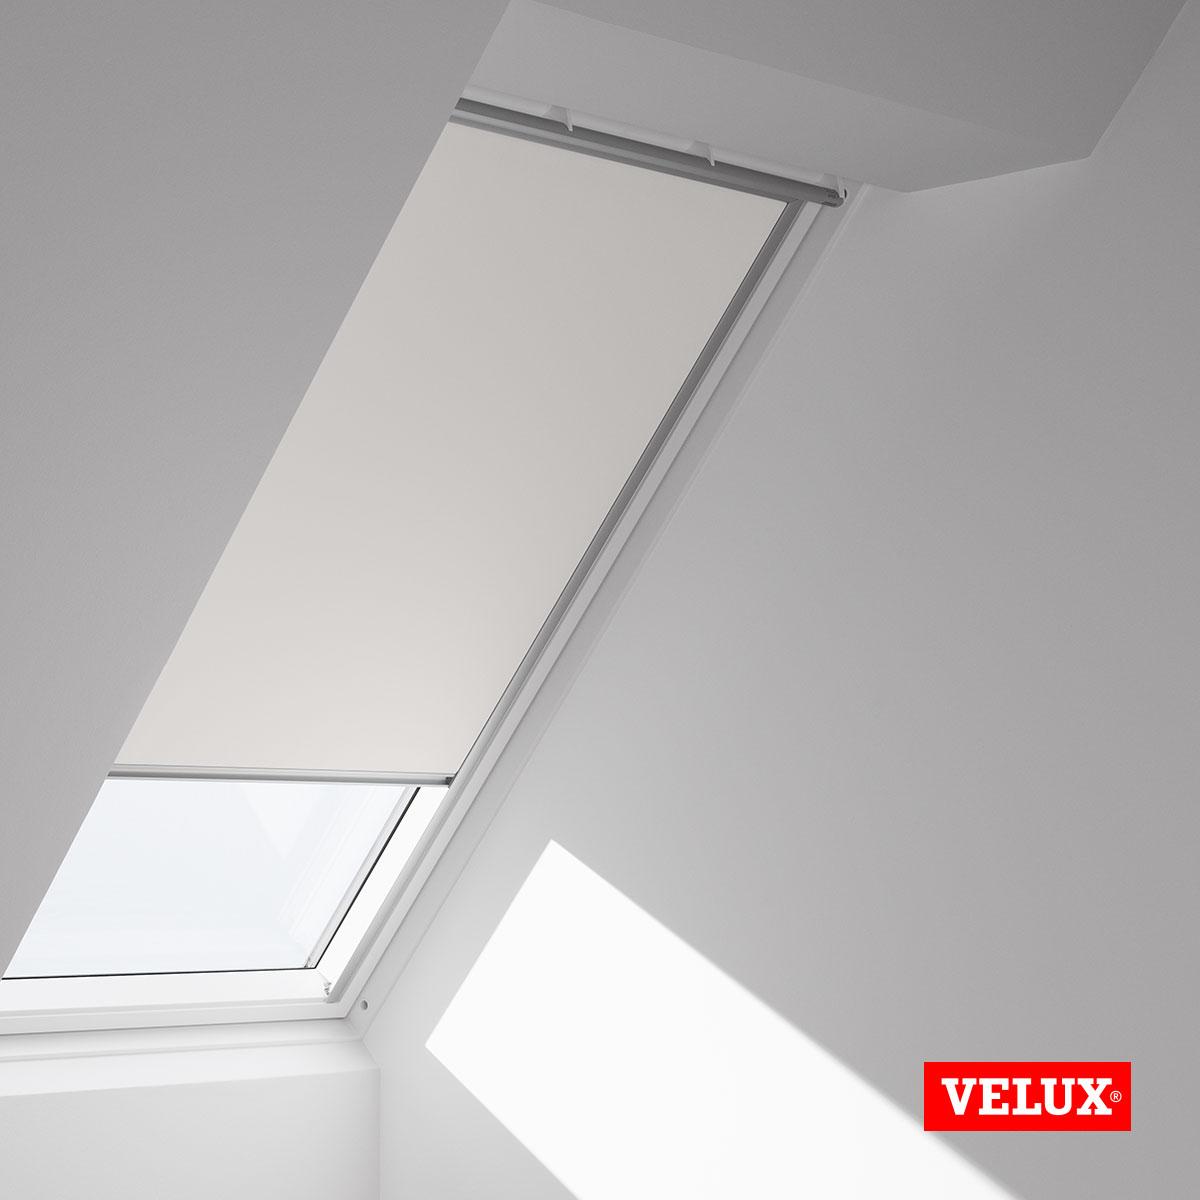 Original velux verdunkelungsrollo f r velux kunstoff for Verdunkelungsrollo dachfenster velux